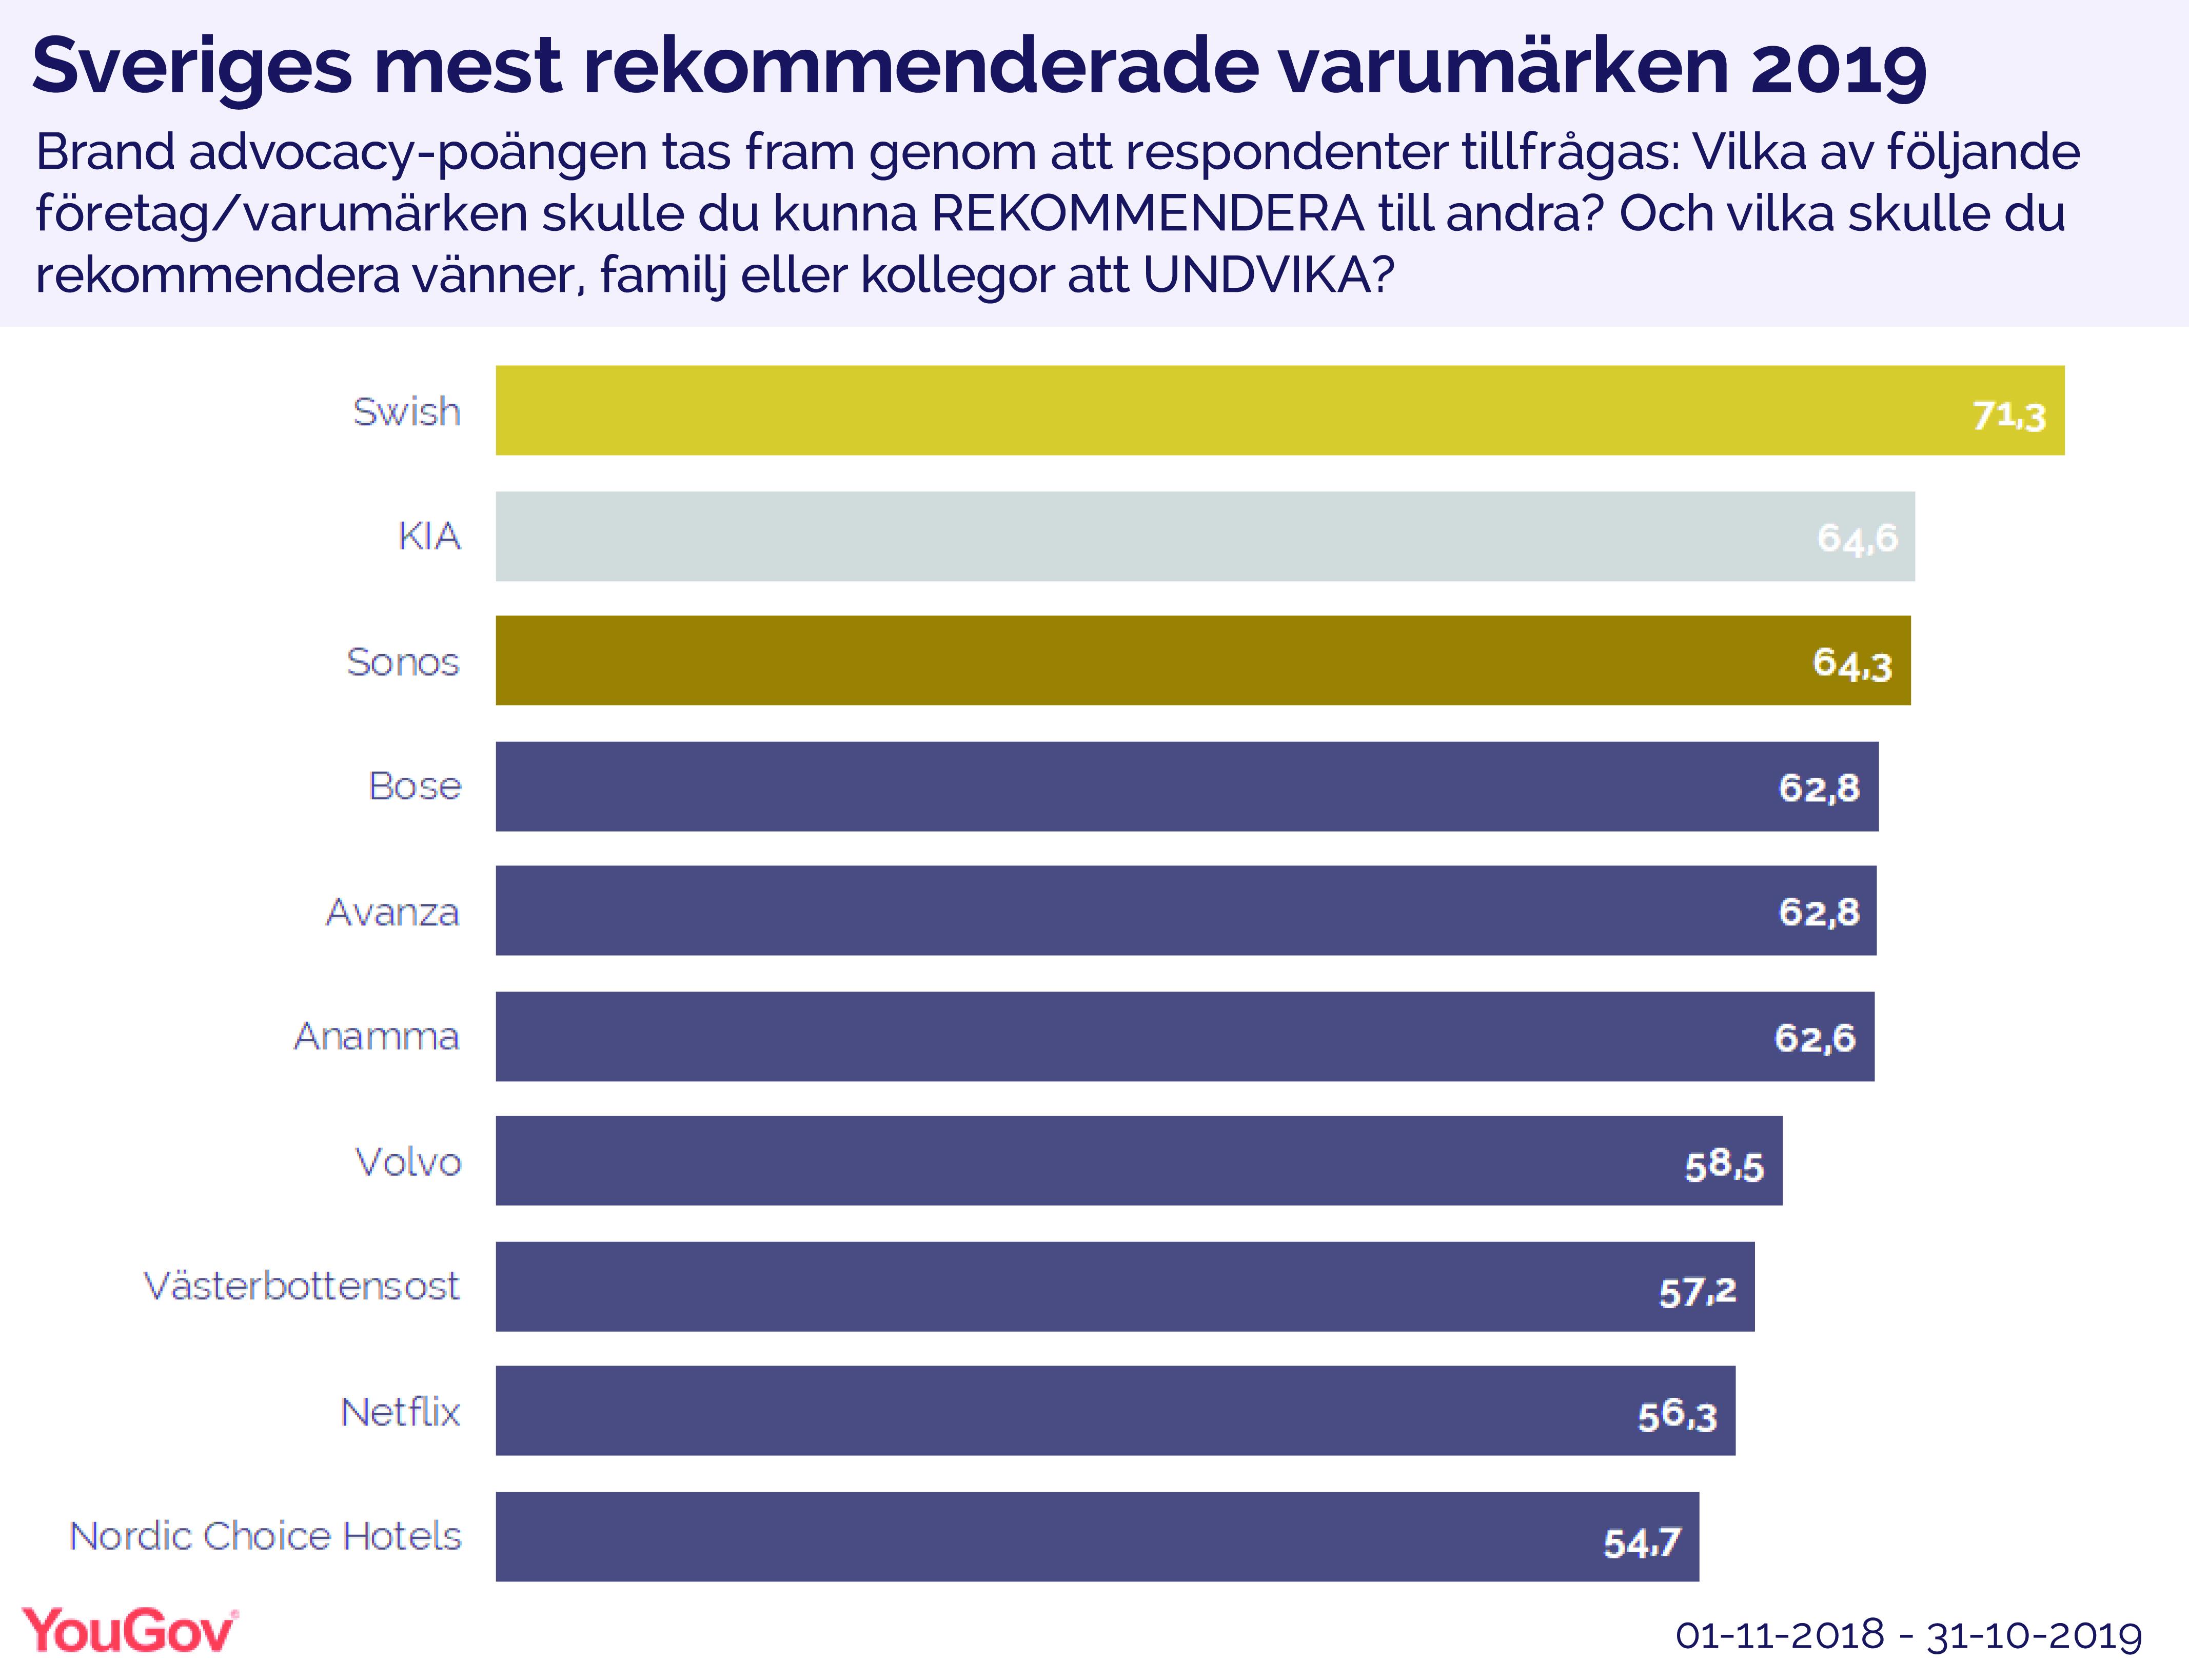 Yougov Brandindex 2019